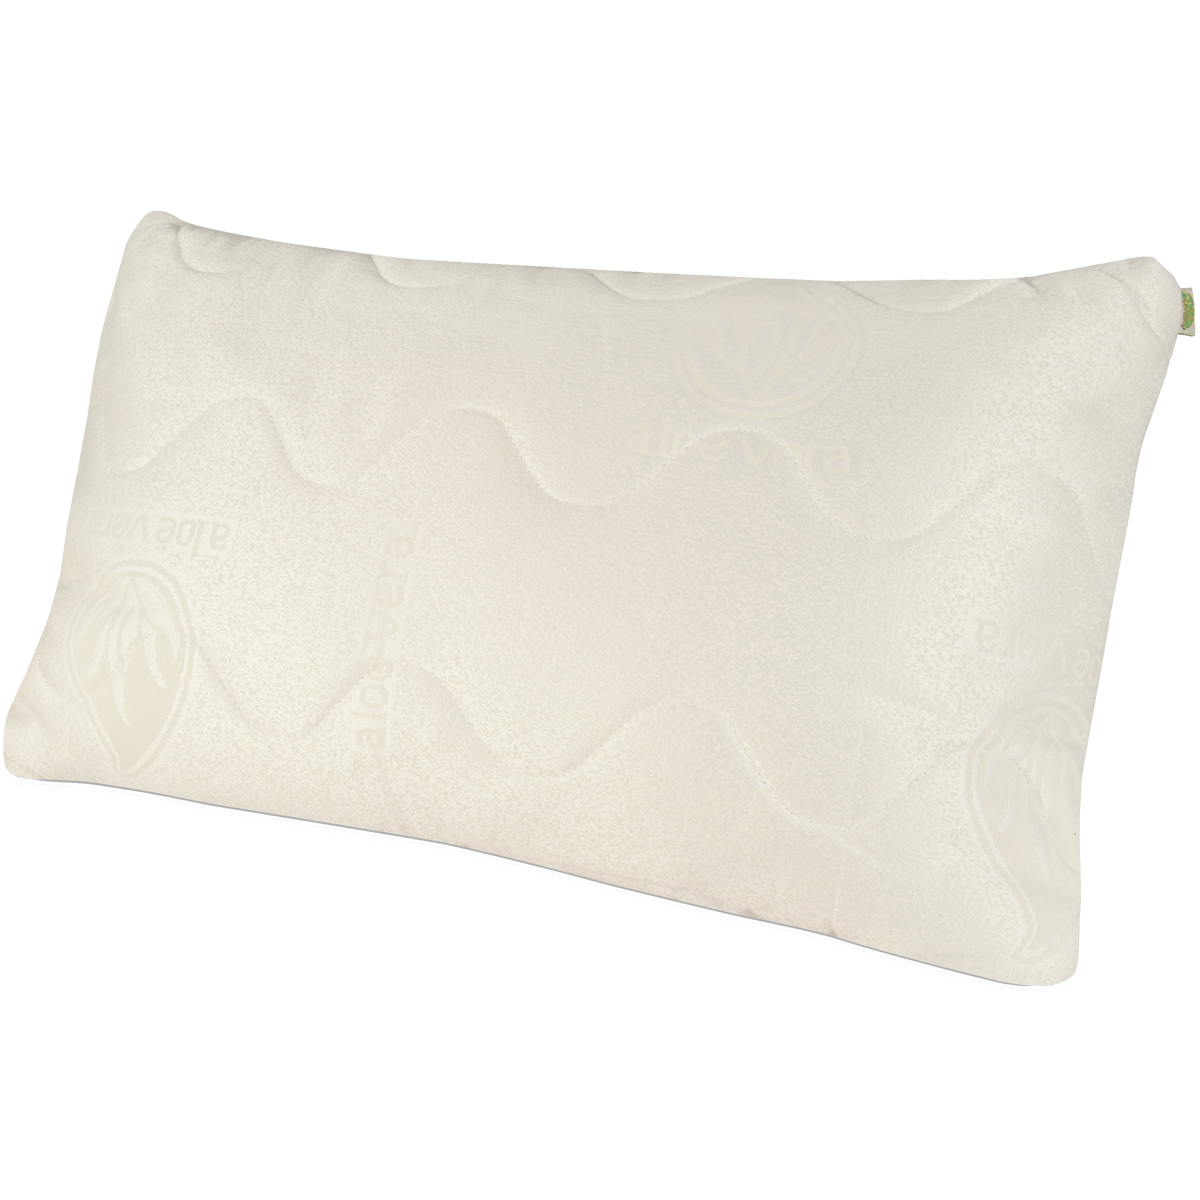 Aloe Infused Latex Pillow